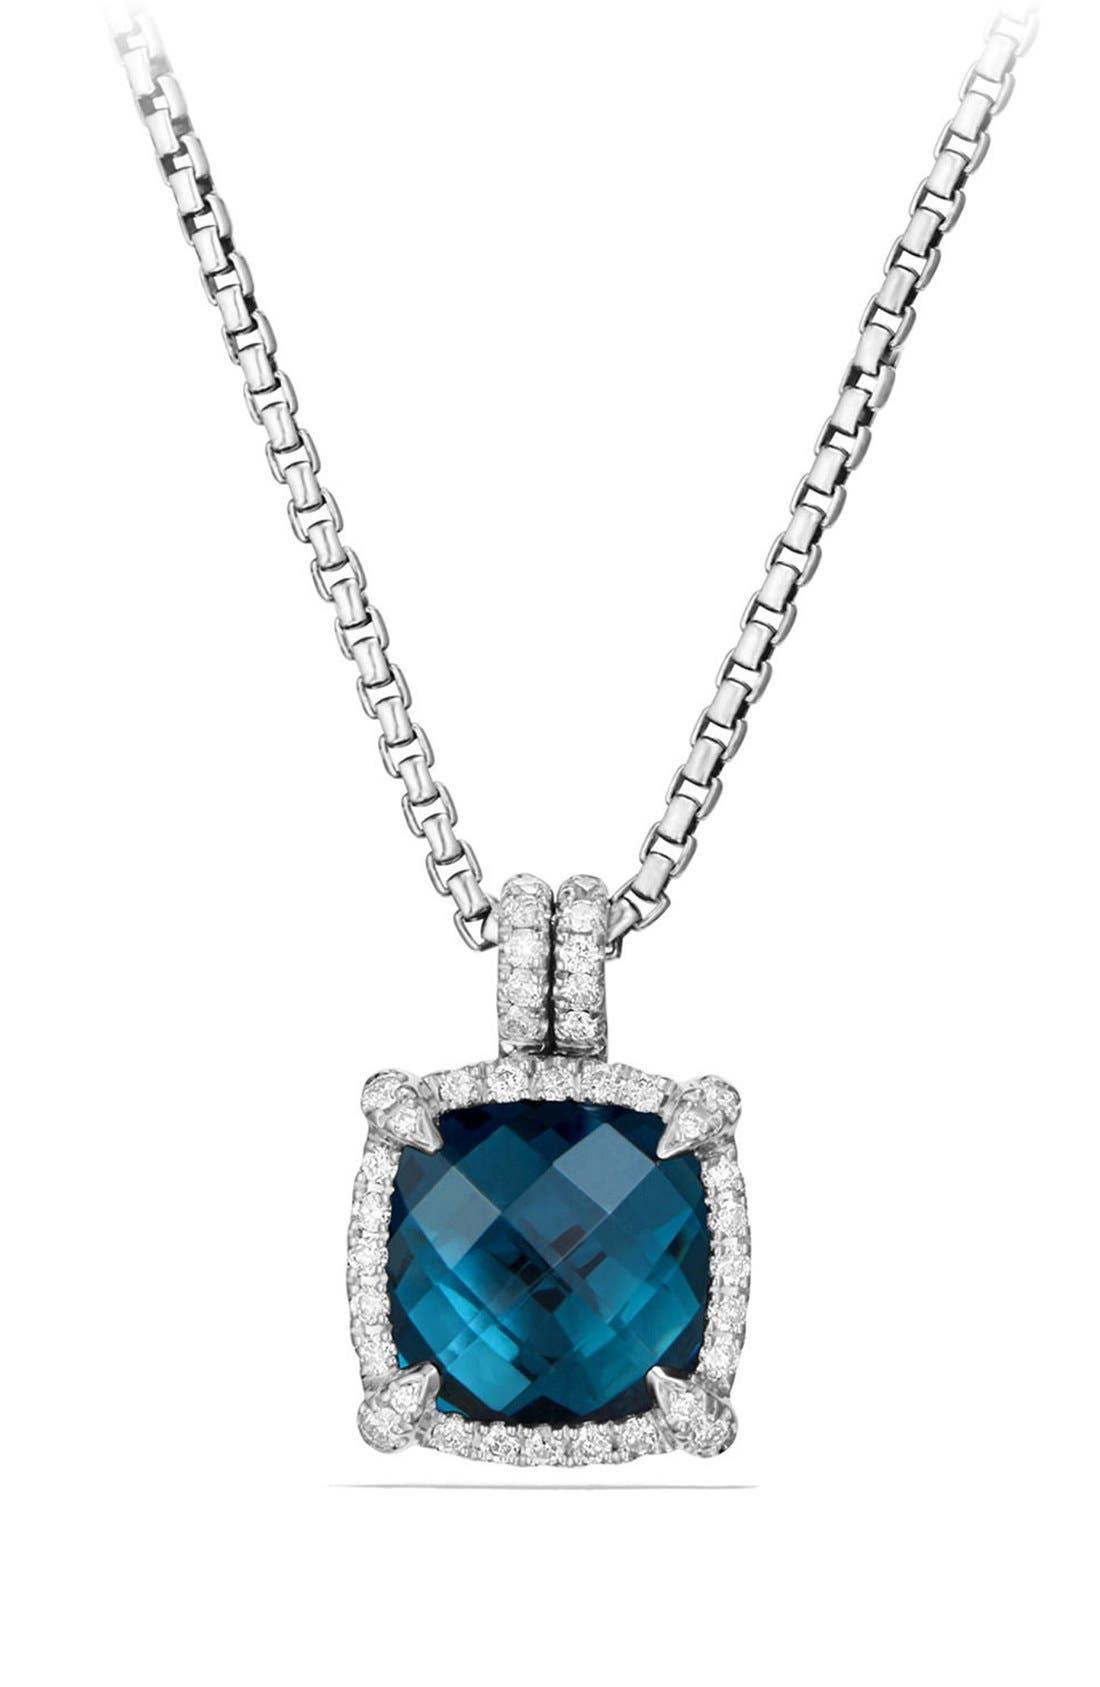 DAVID YURMAN Châtelaine Small Pavé Bezel Pendant Necklace with Diamonds